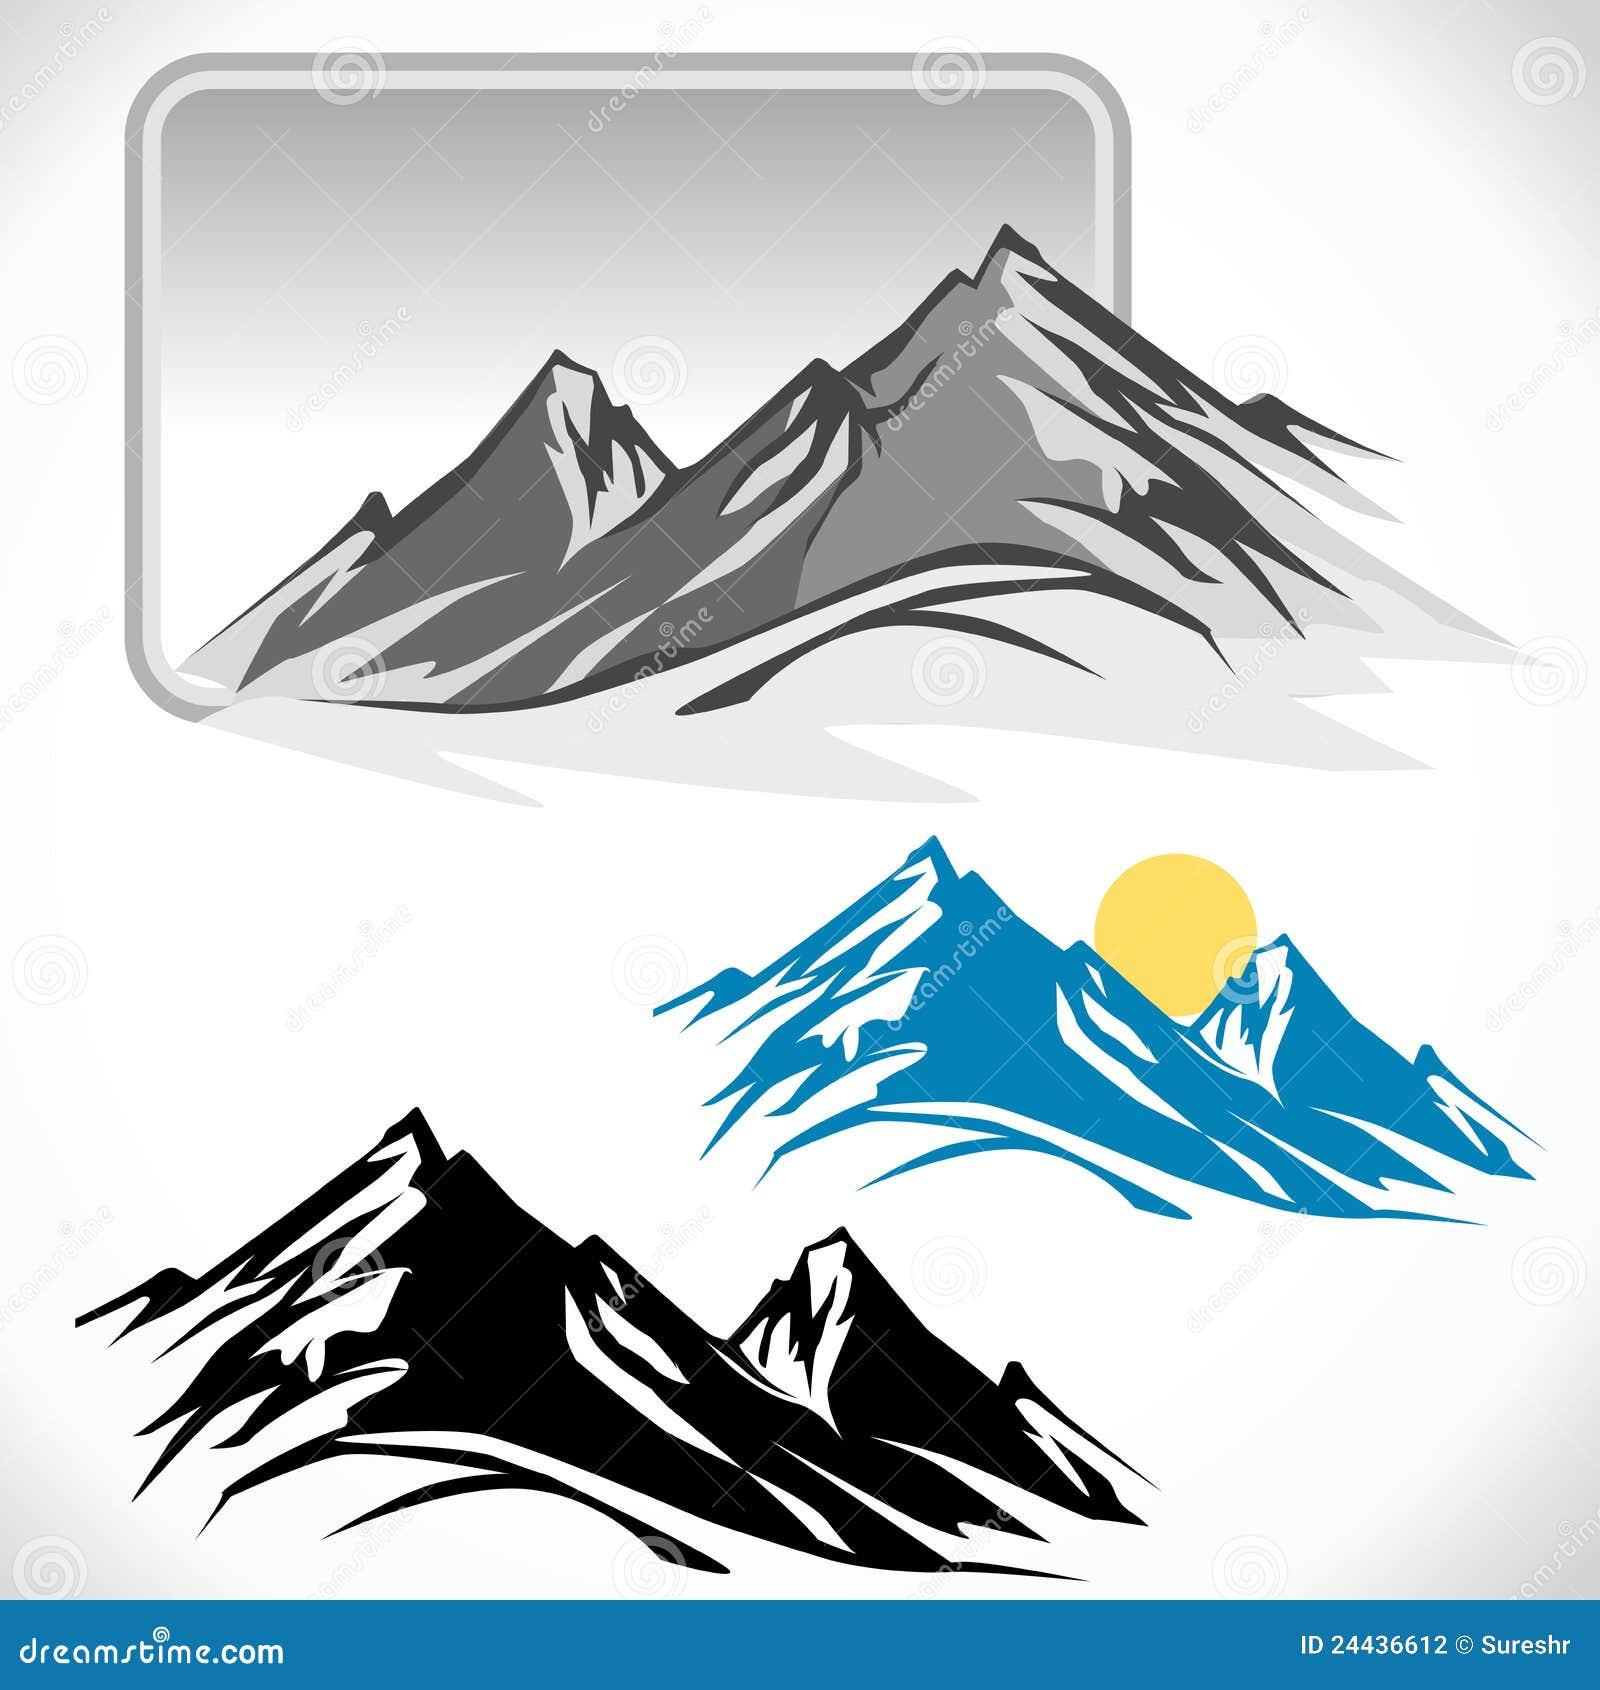 Amazing Glaciers On Mountain Peaks